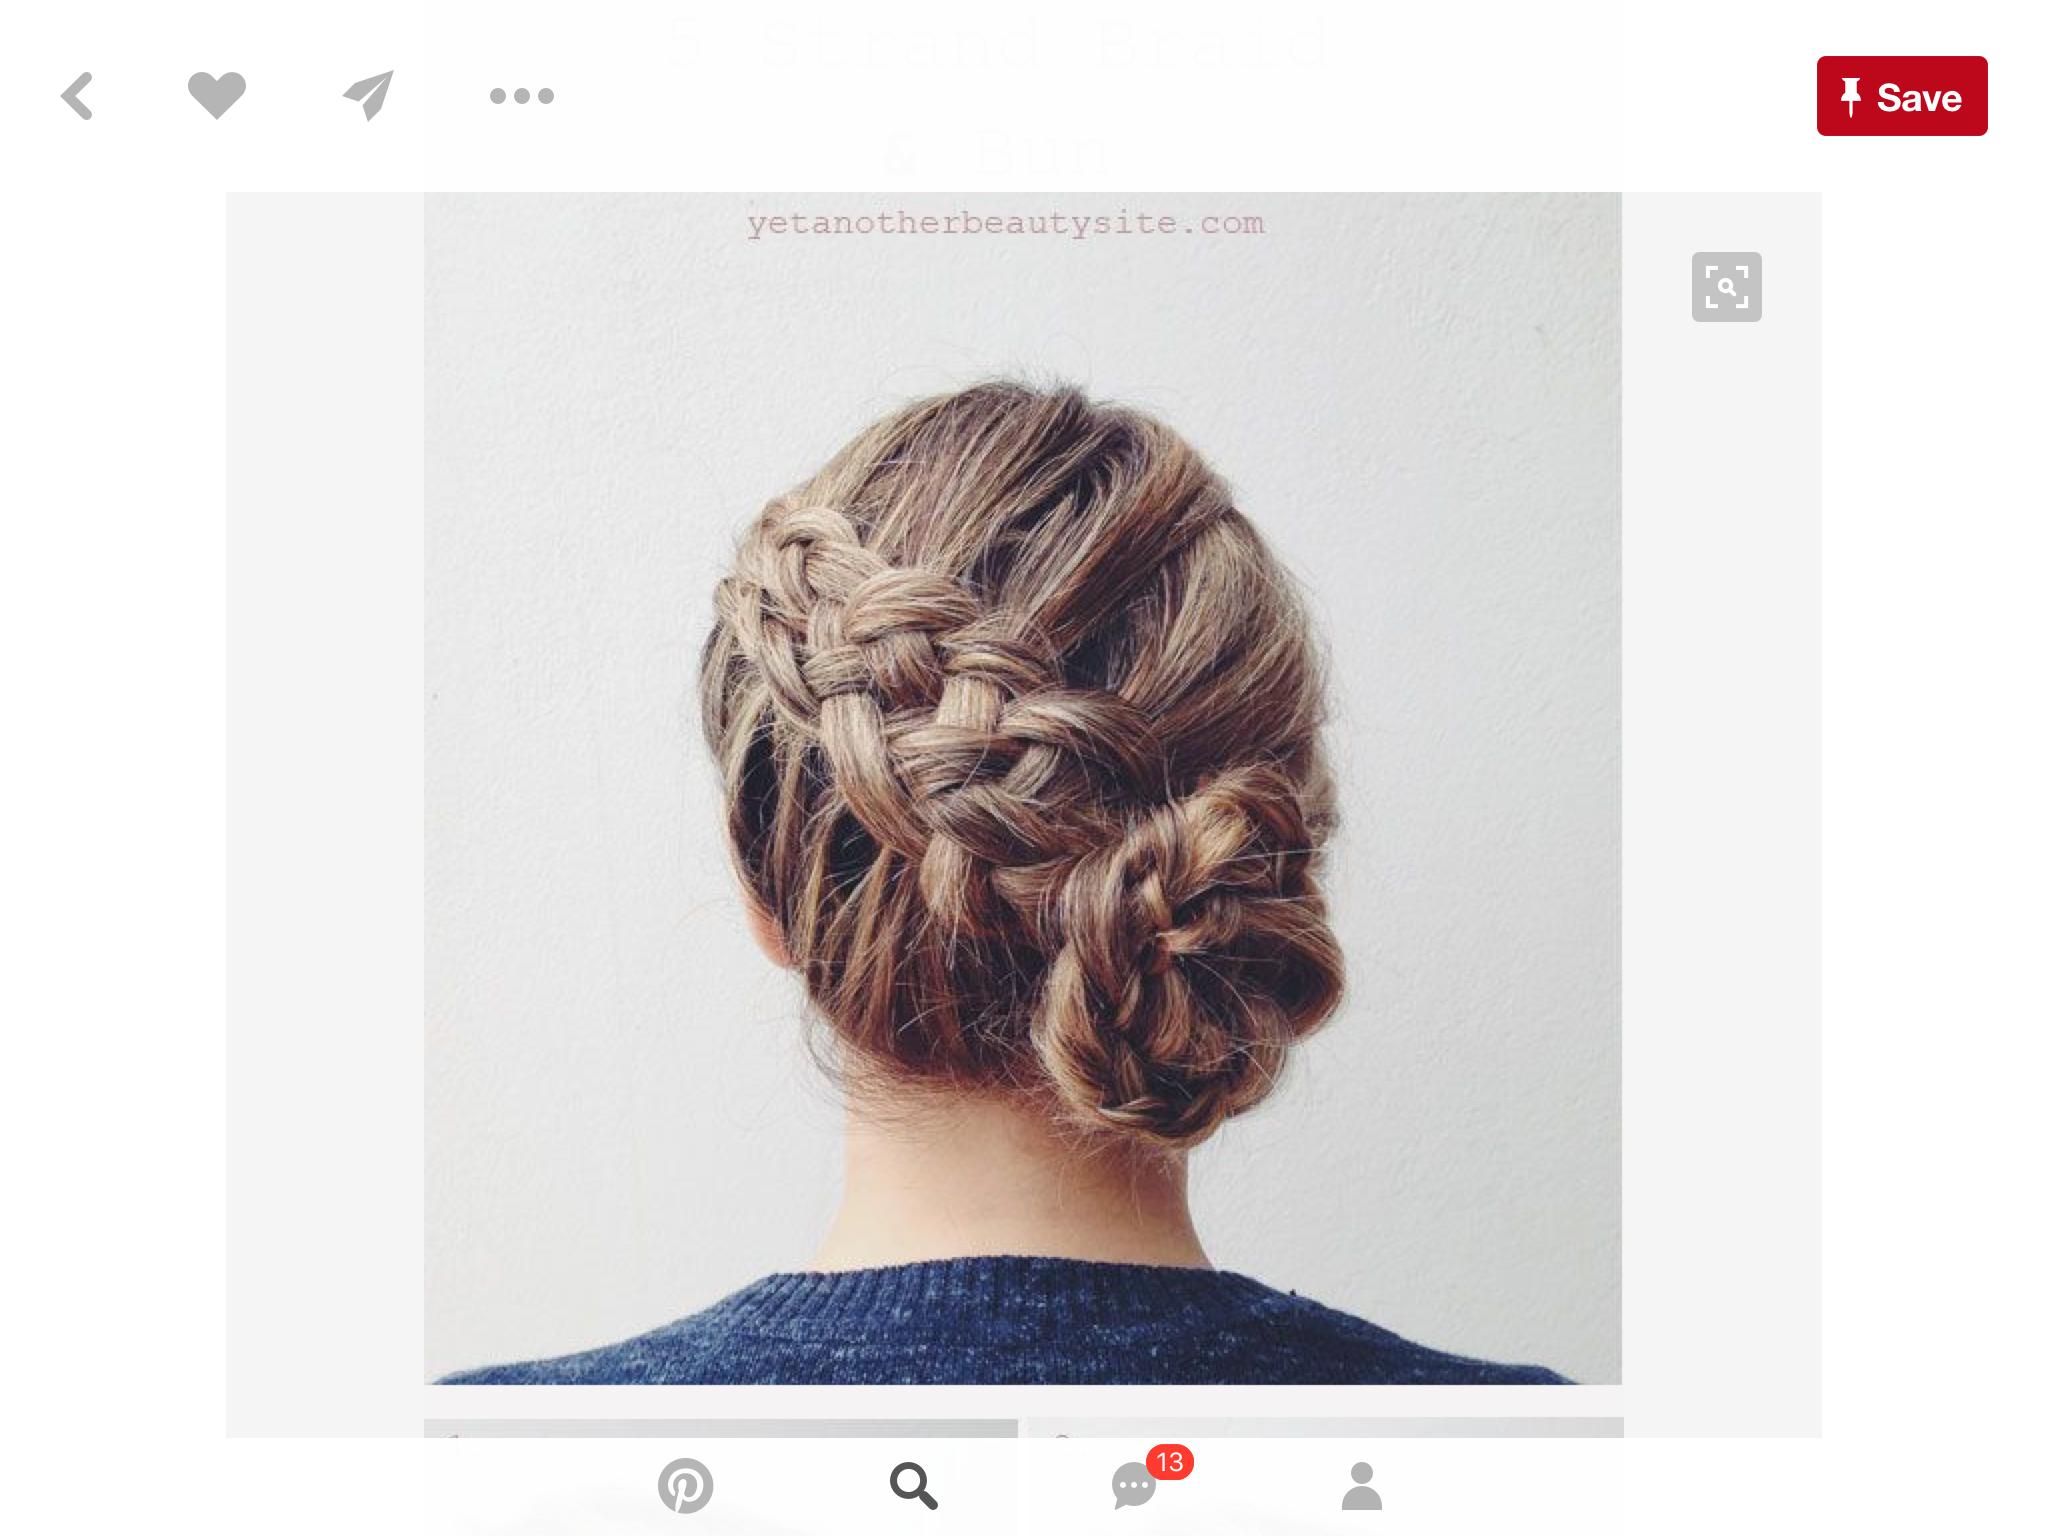 Pin by Karen Cherry on Brenda\'s Quinceneria | Pinterest | Up dos